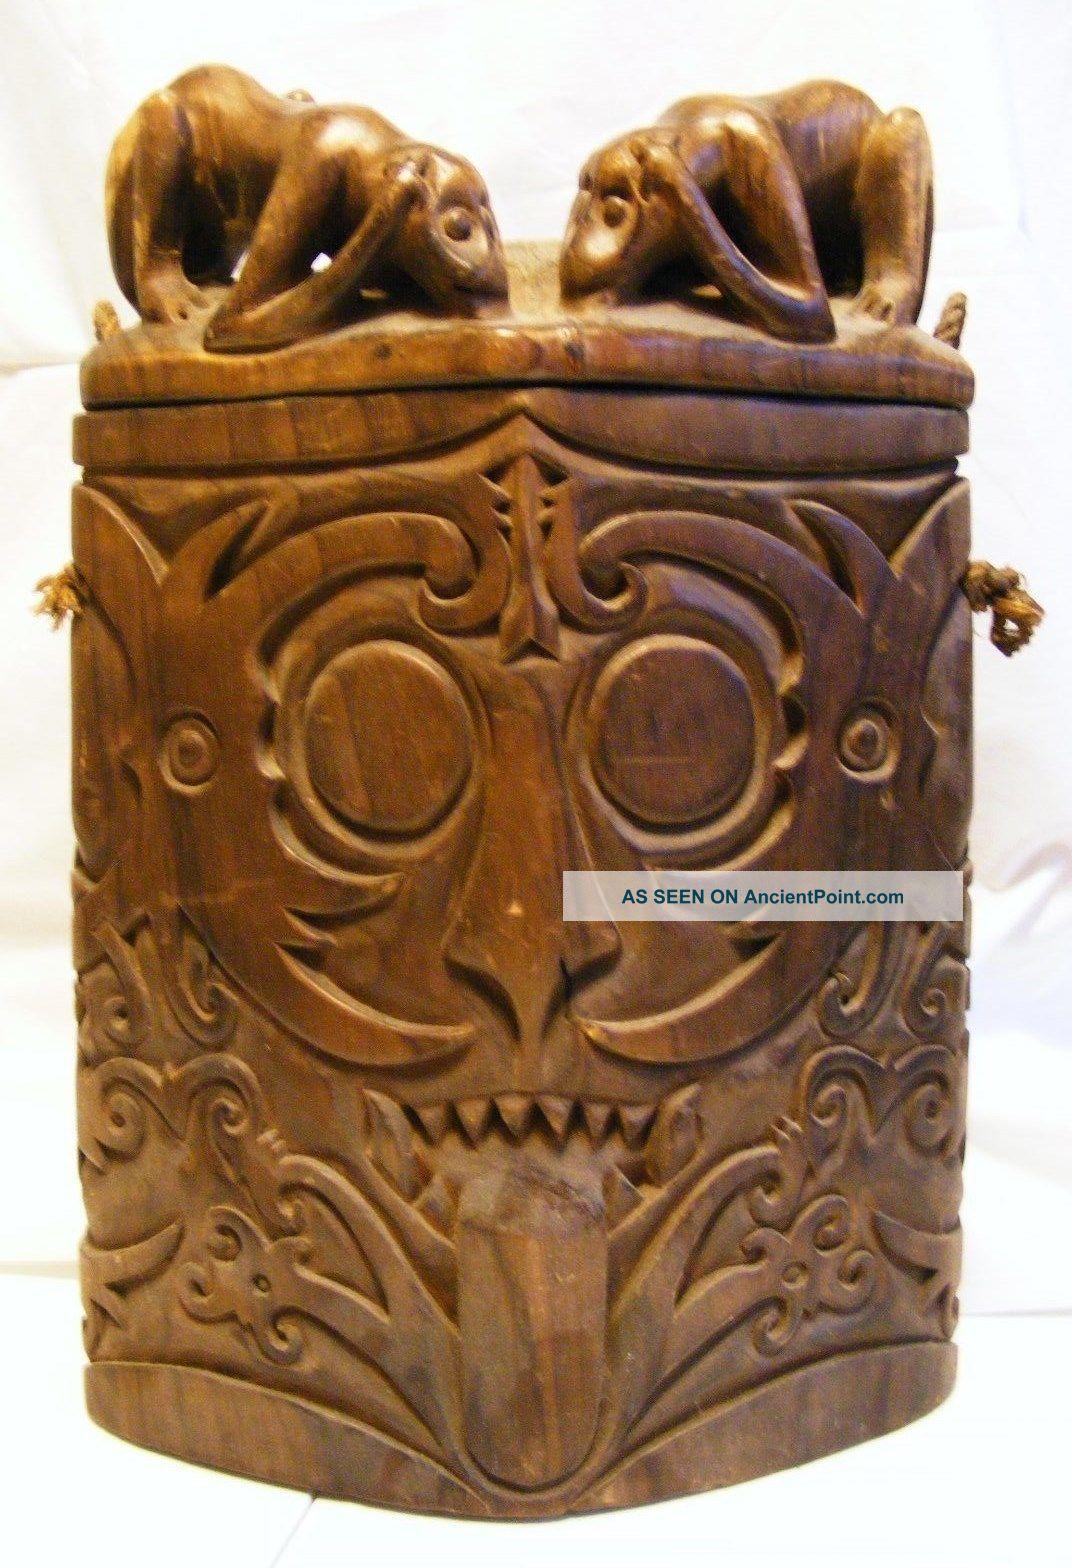 Antique Indonesian Dayak Borneo Box Chamber Statue Sculpture Borneo Pacific Islands & Oceania photo